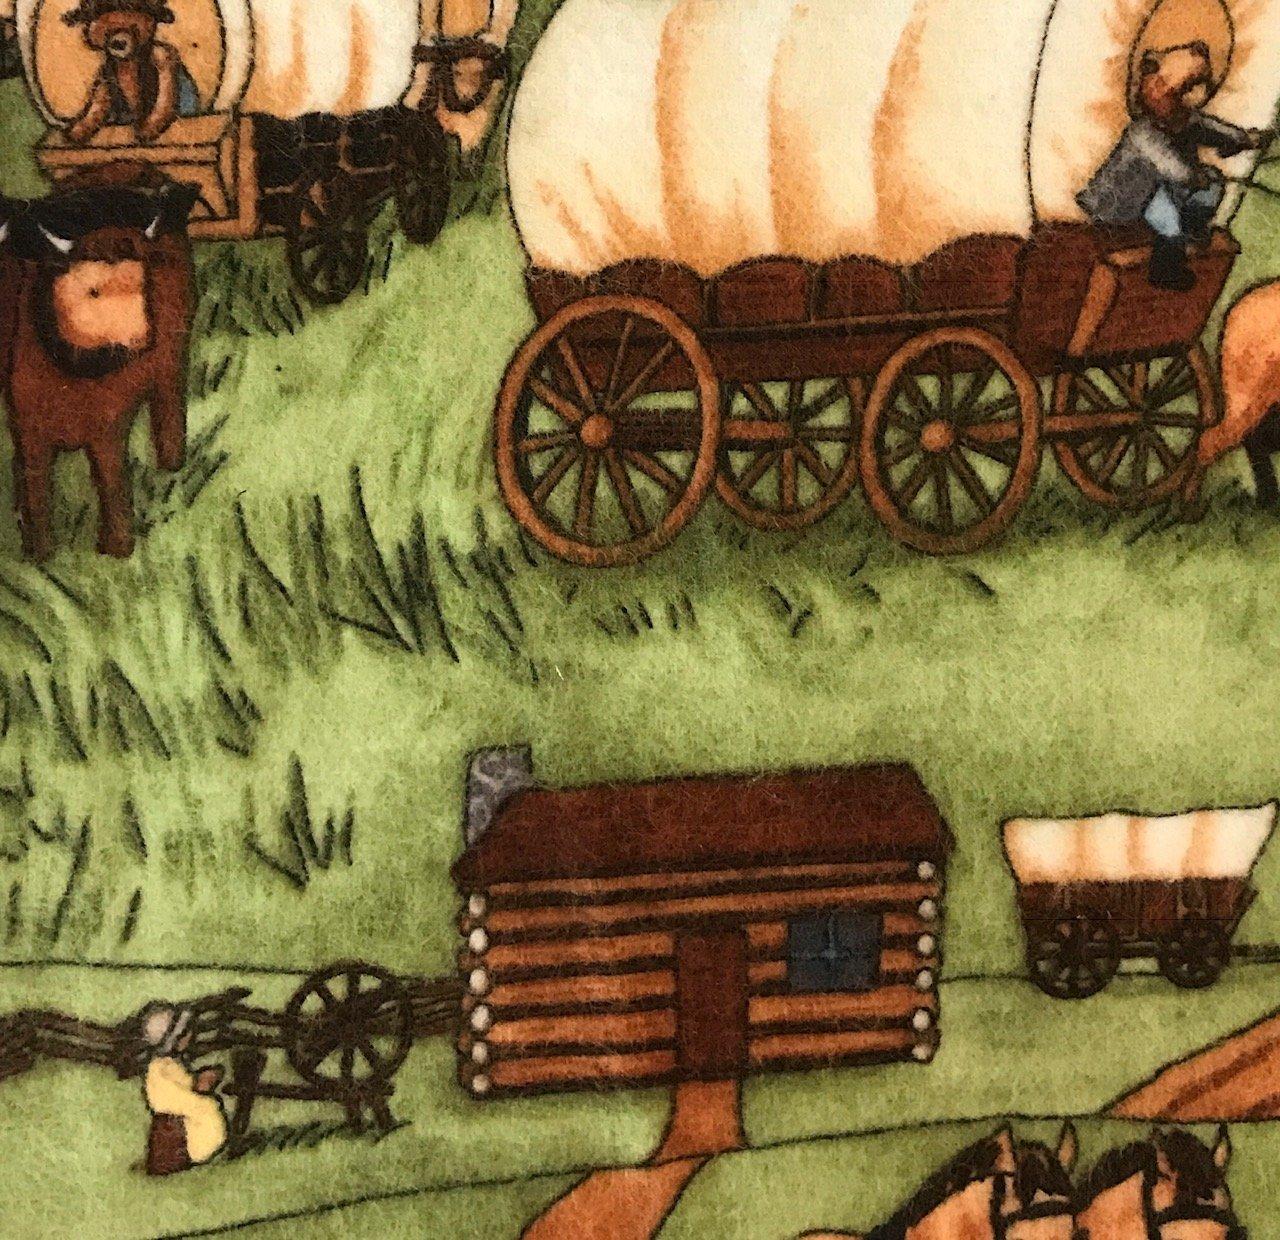 100% Cotton Flannel - Wagon Trail Bears